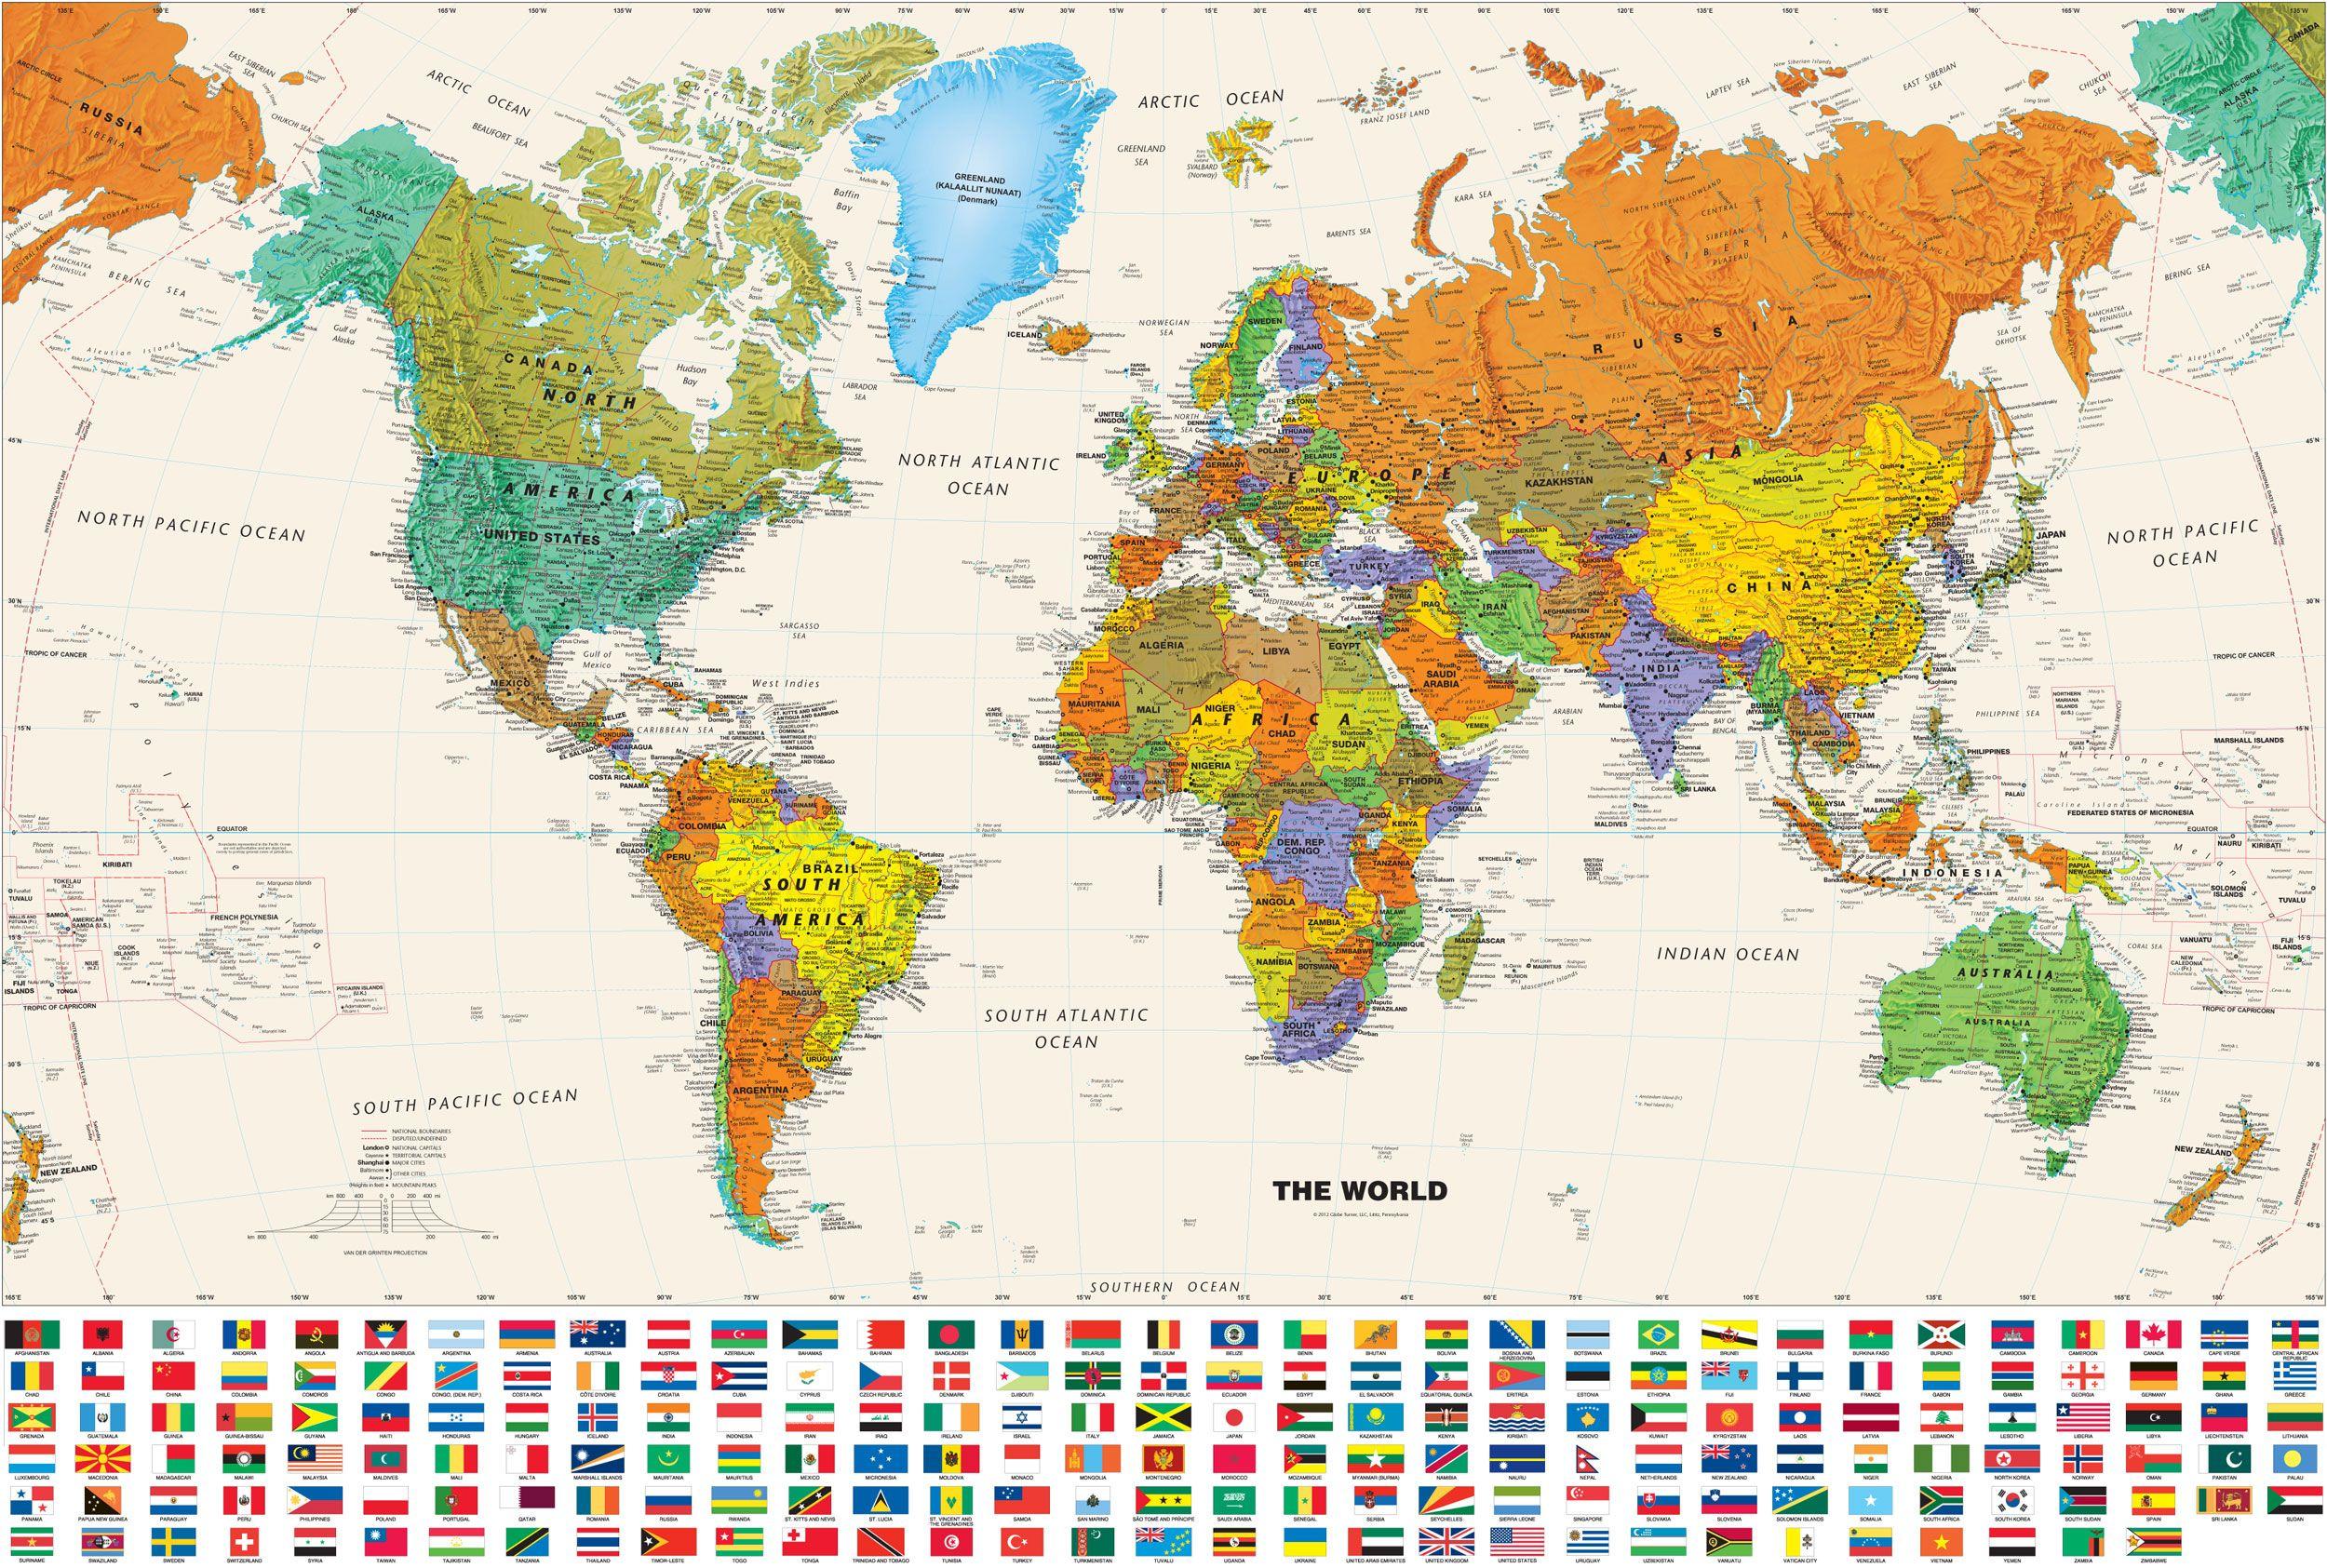 Mapa De Los Paises.Mapa De Paises Del Mundo 2015 En 2019 Mapa Mural Del